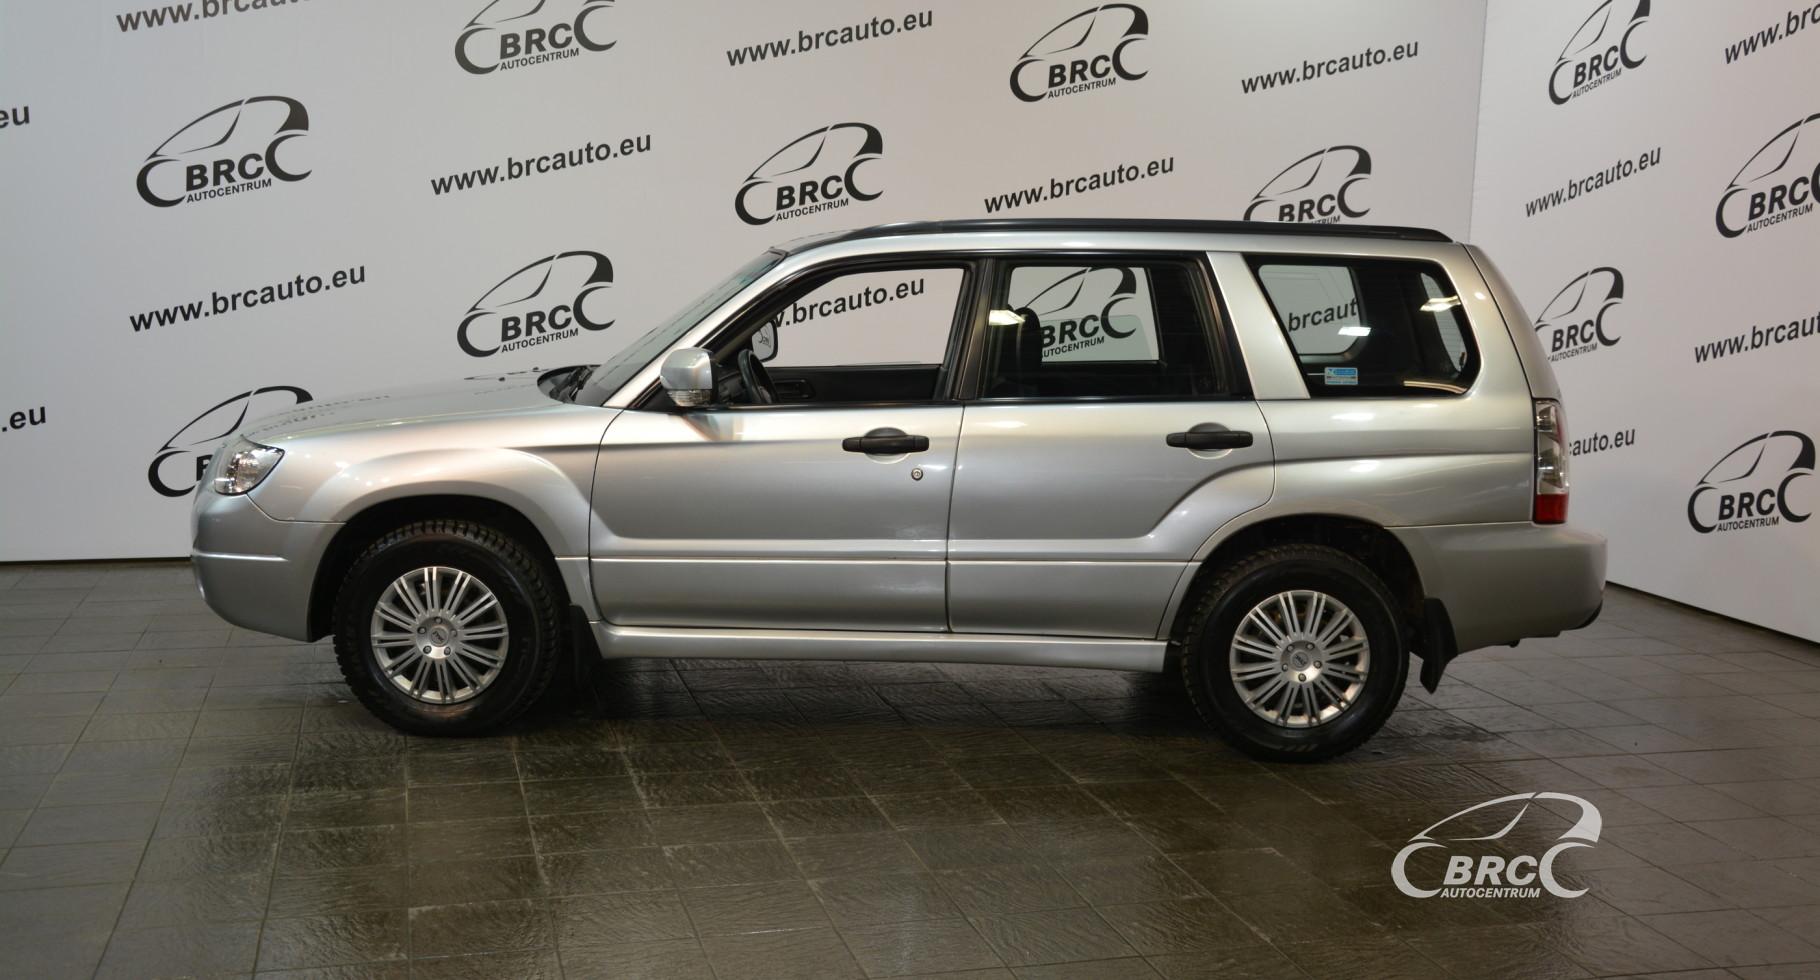 Subaru Forester 2.0i 4WD